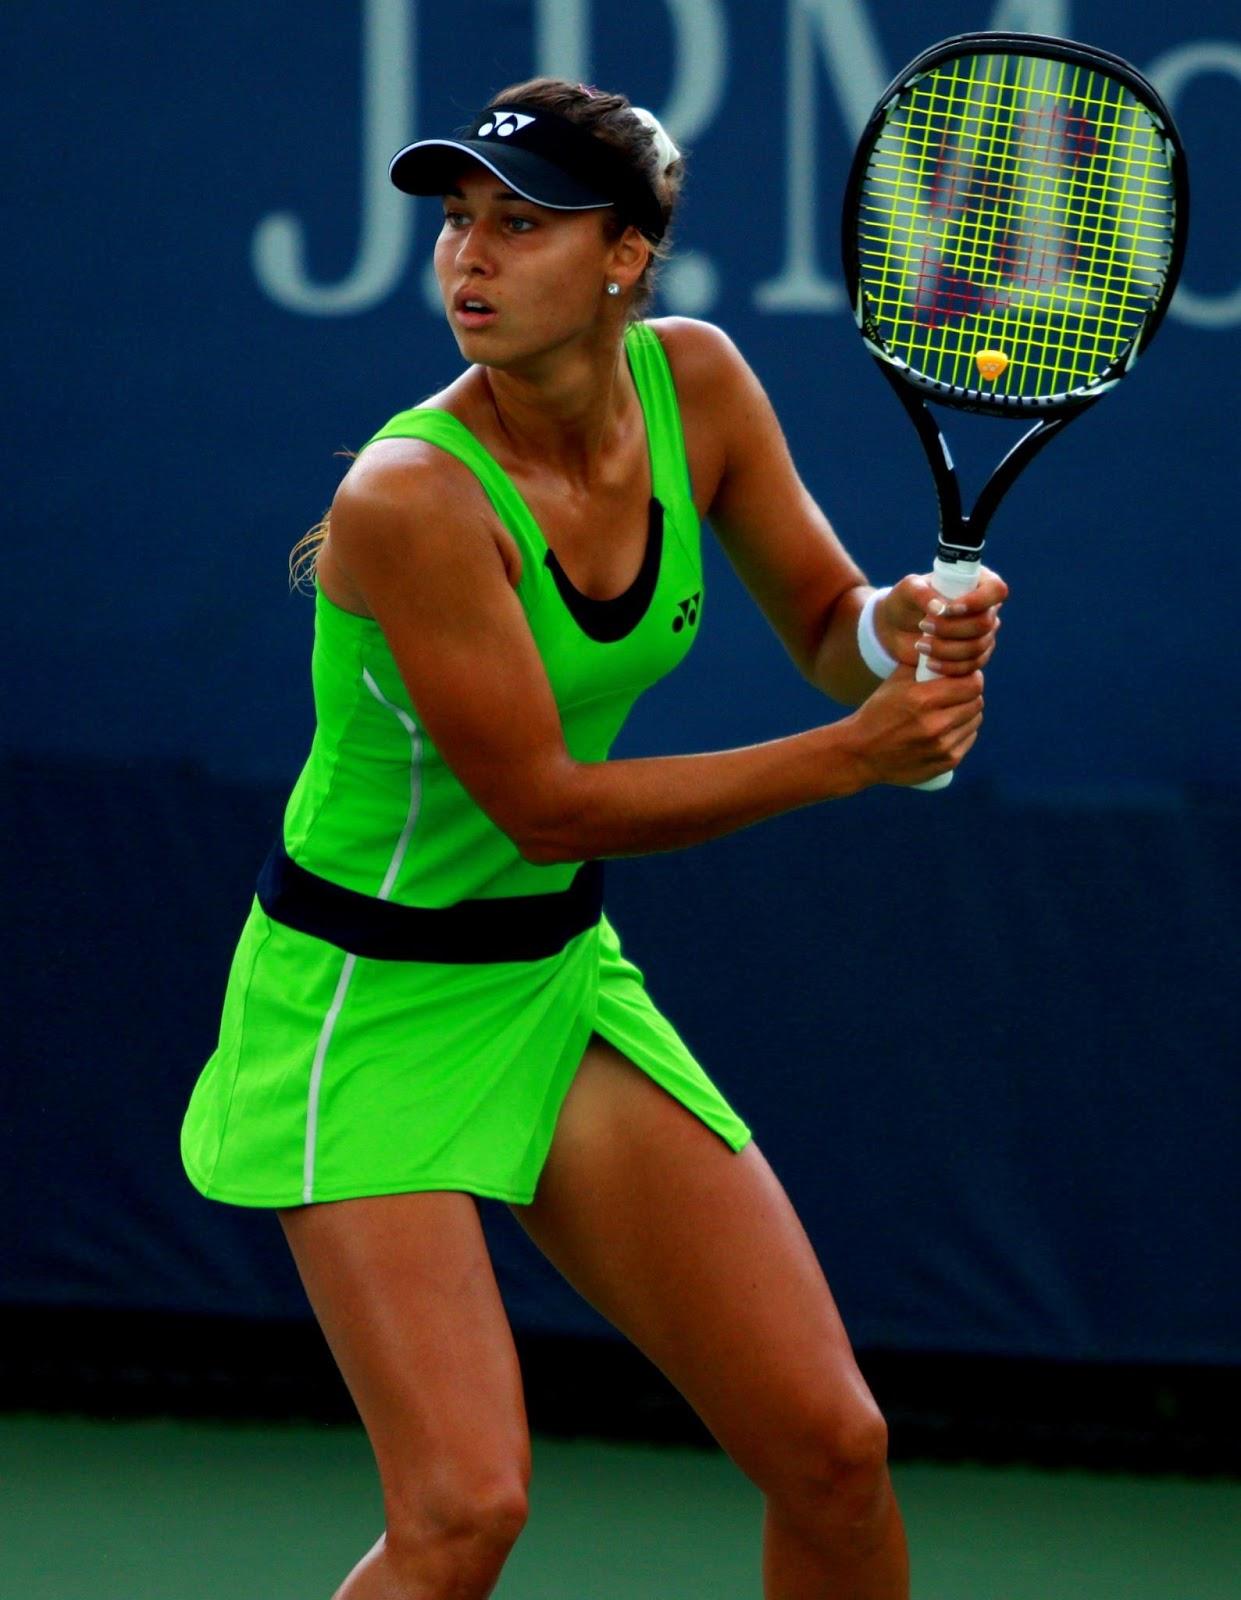 WTA Hotties: 2012 Hot-100: #16 Vitalia Diatchenko